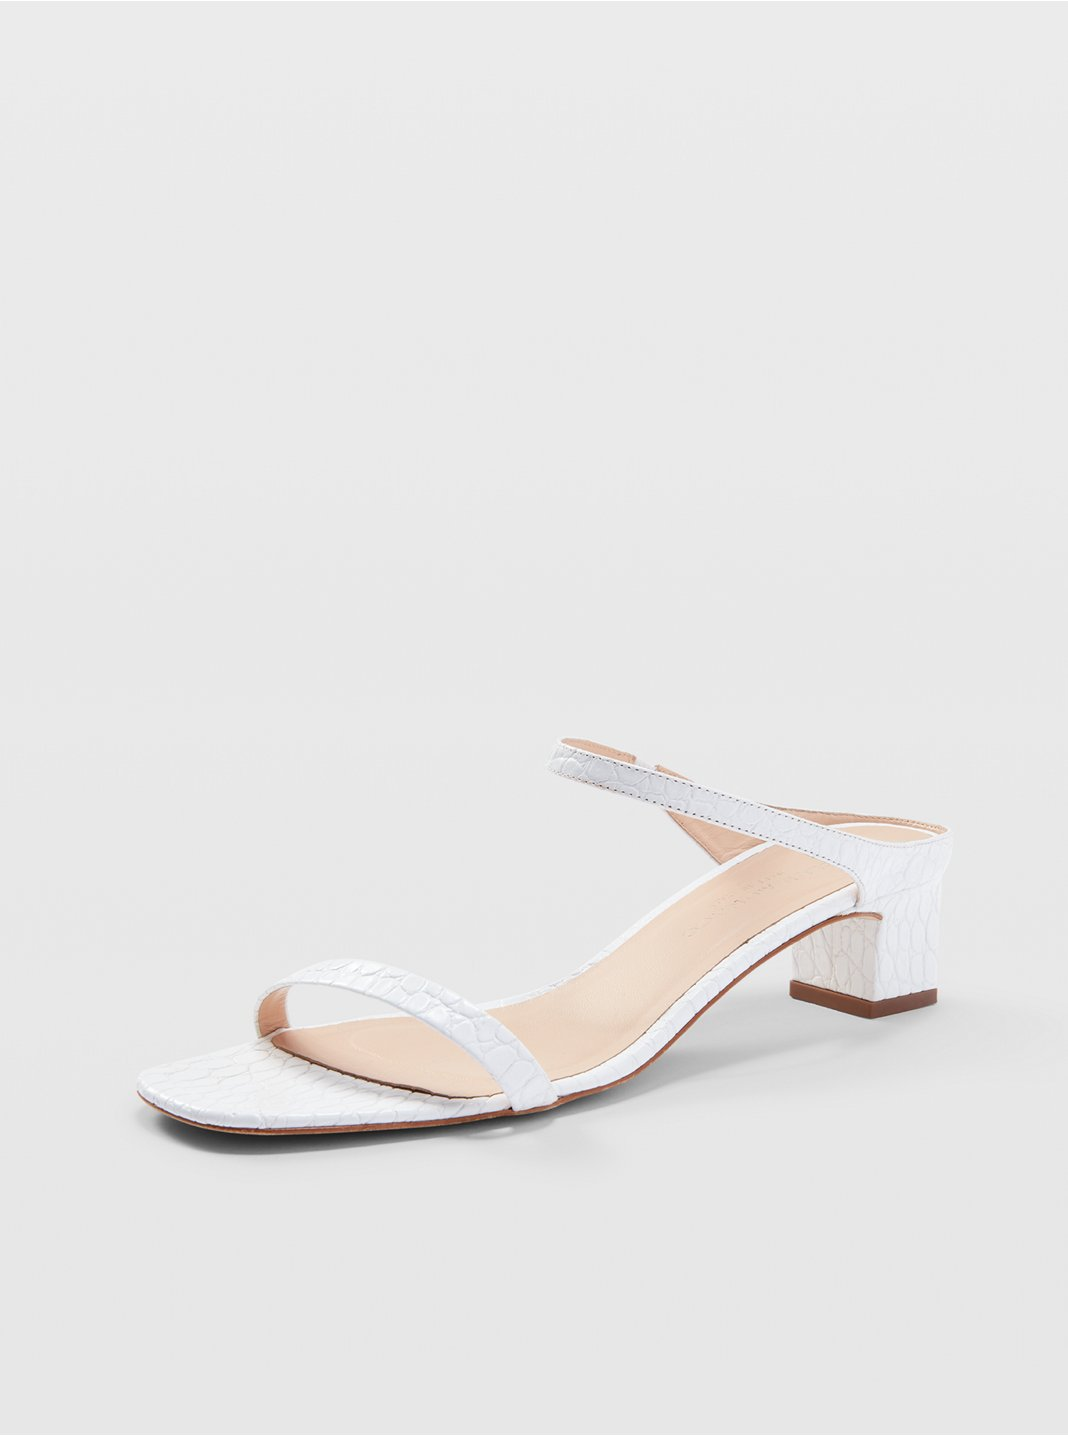 Marnee Sandals